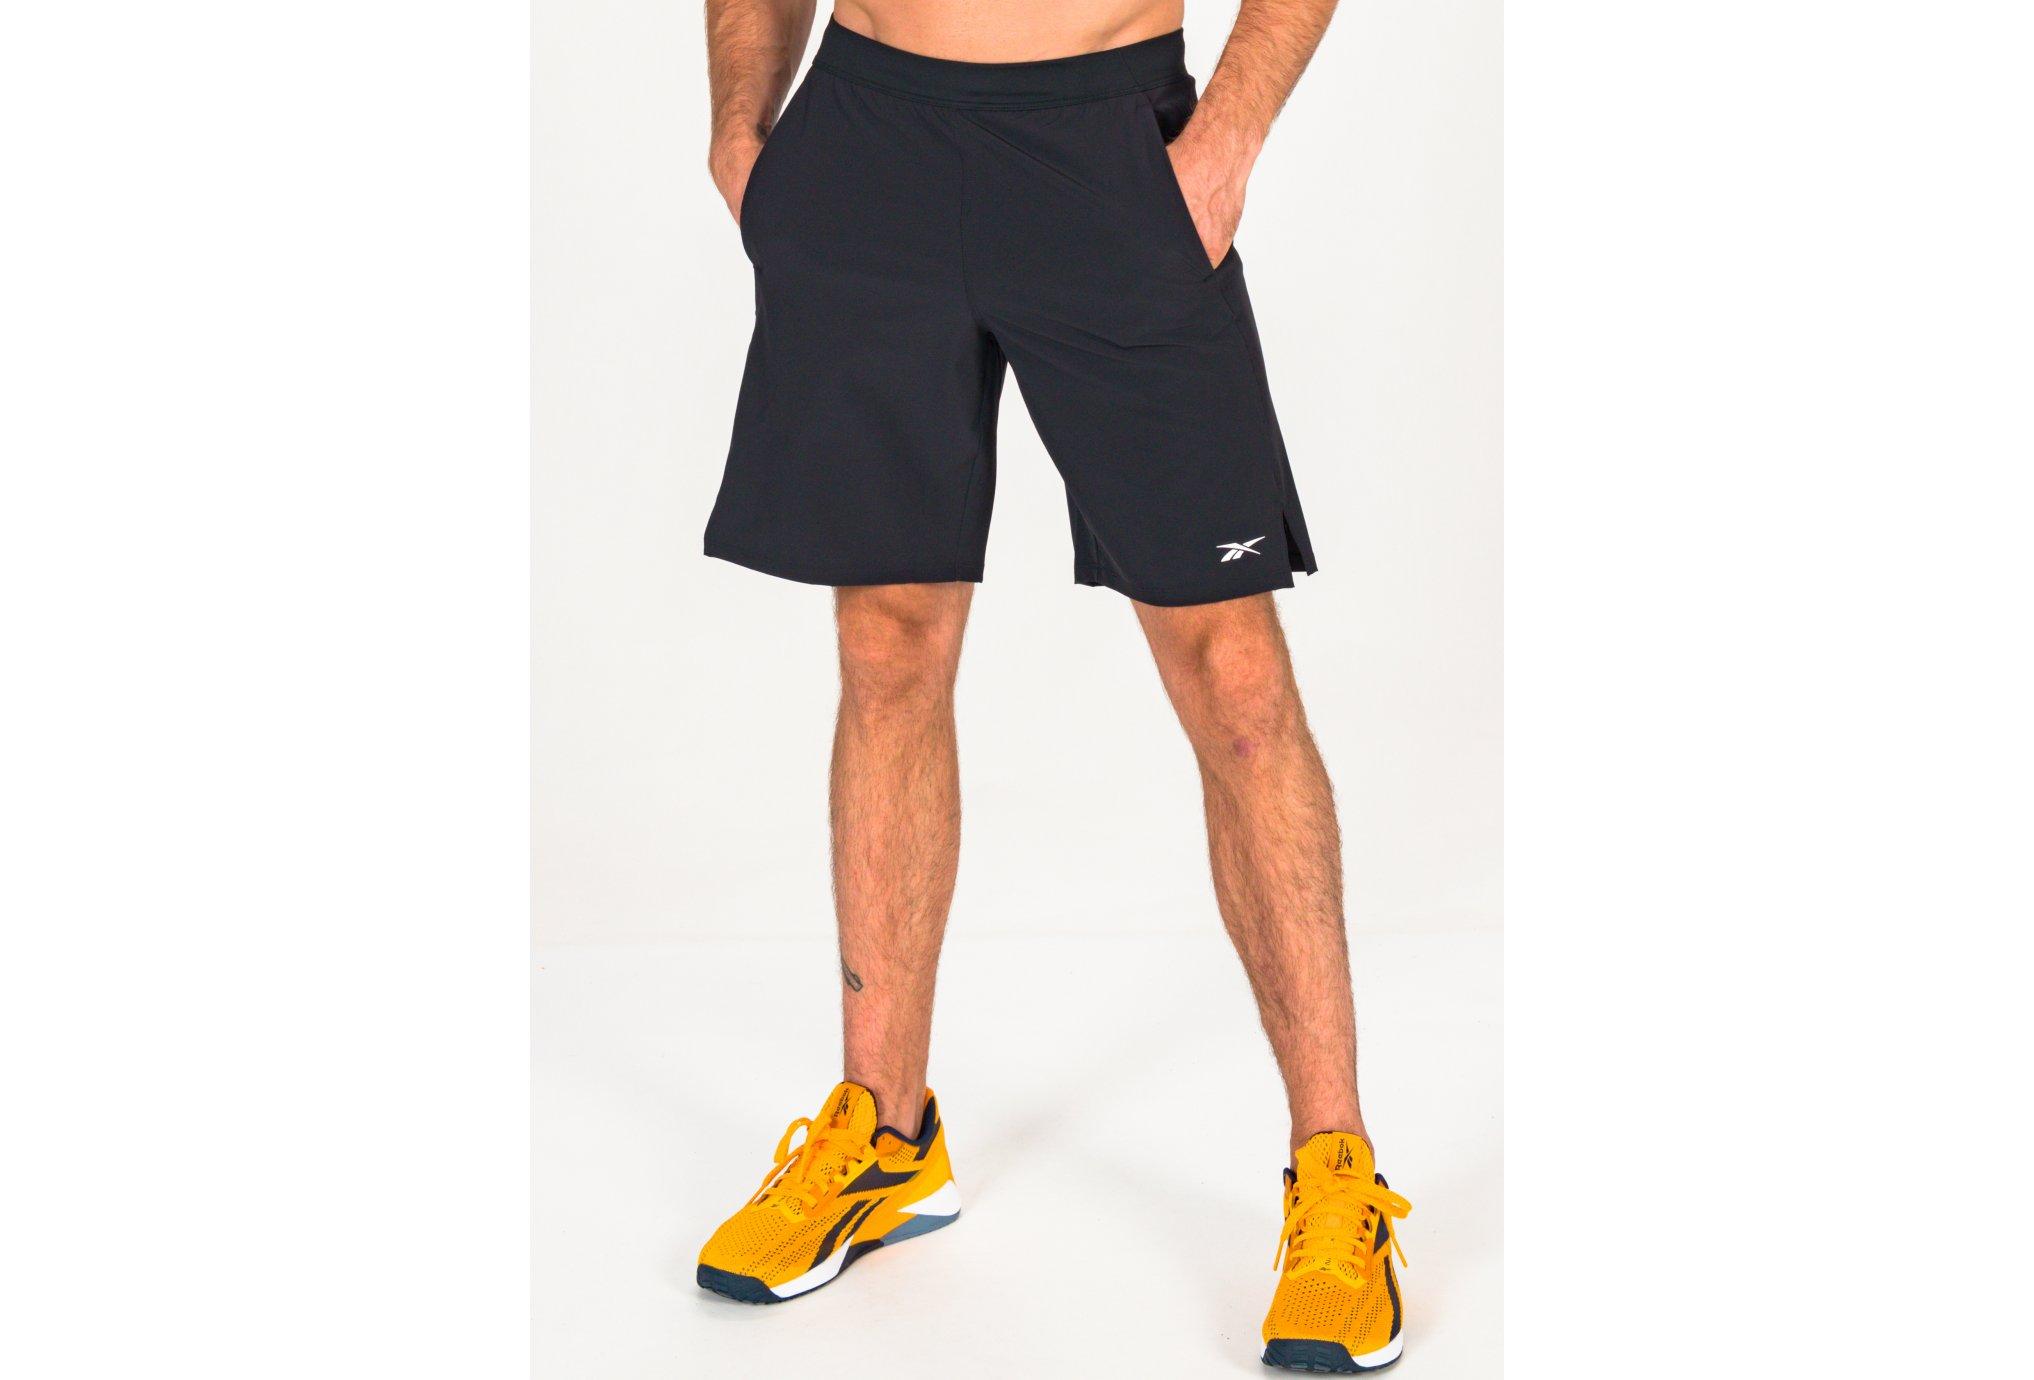 Reebok Epic M vêtement running homme